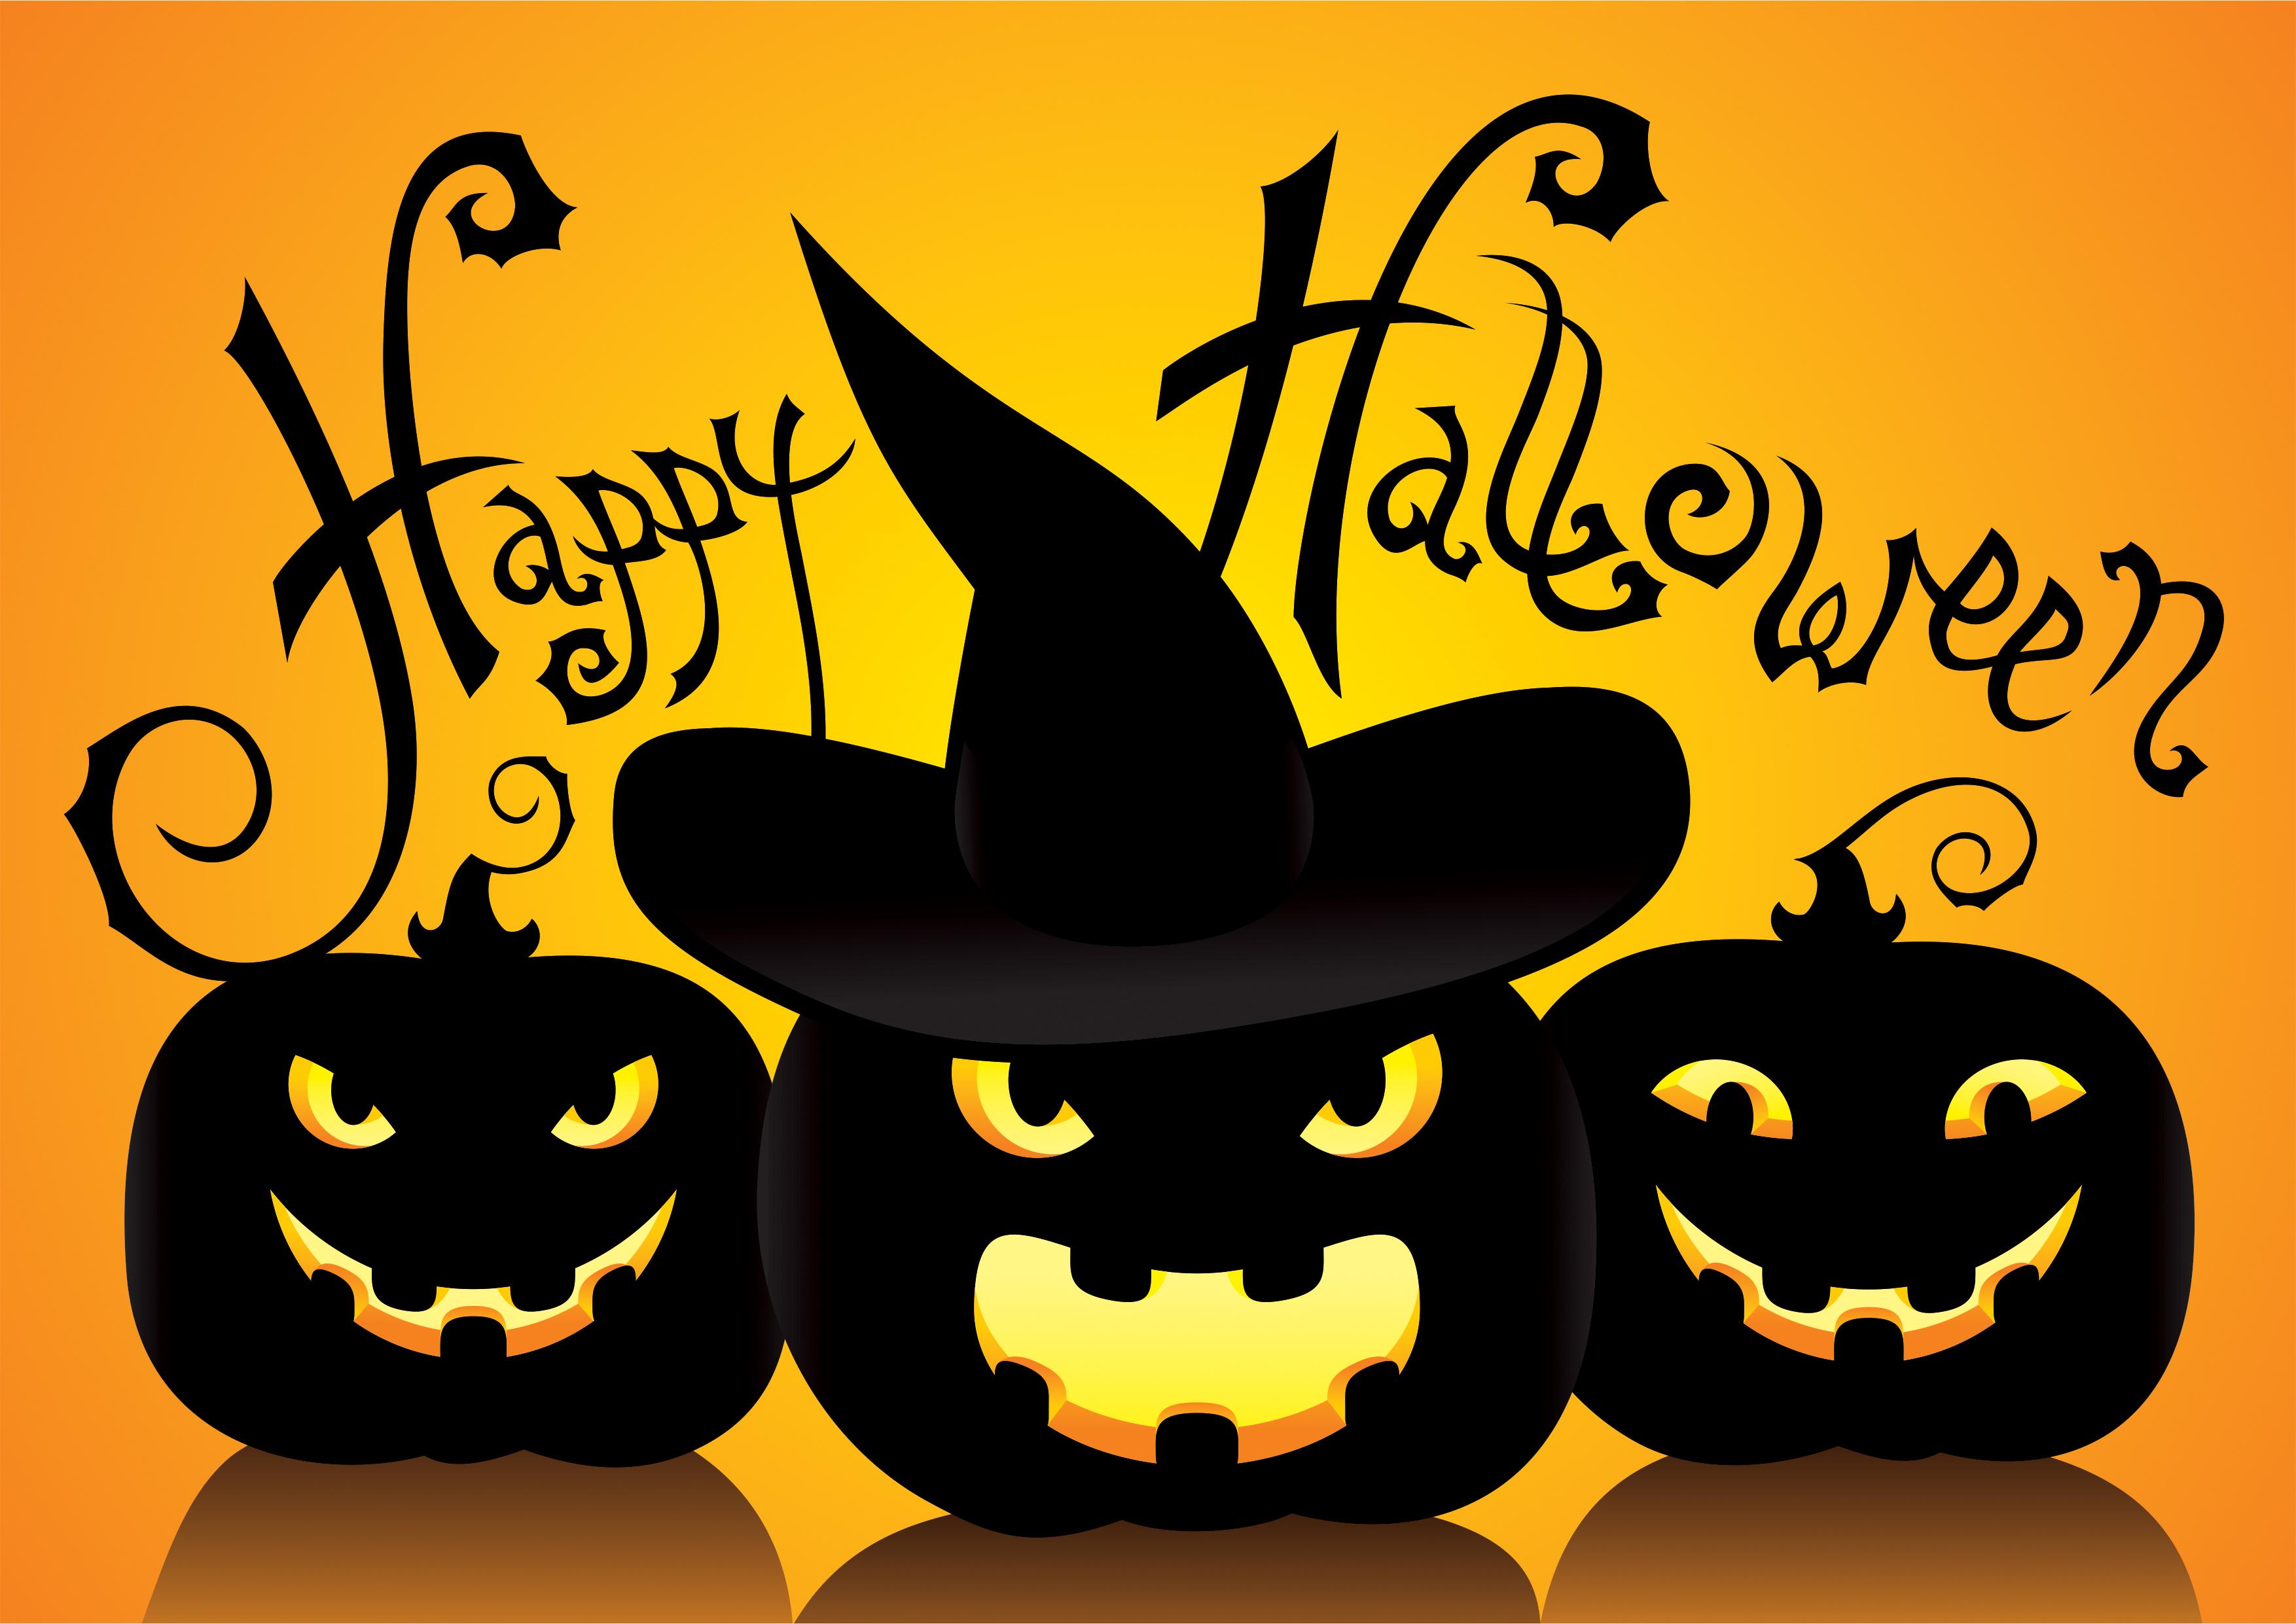 Nice wallpapers Halloween 3508x2482px